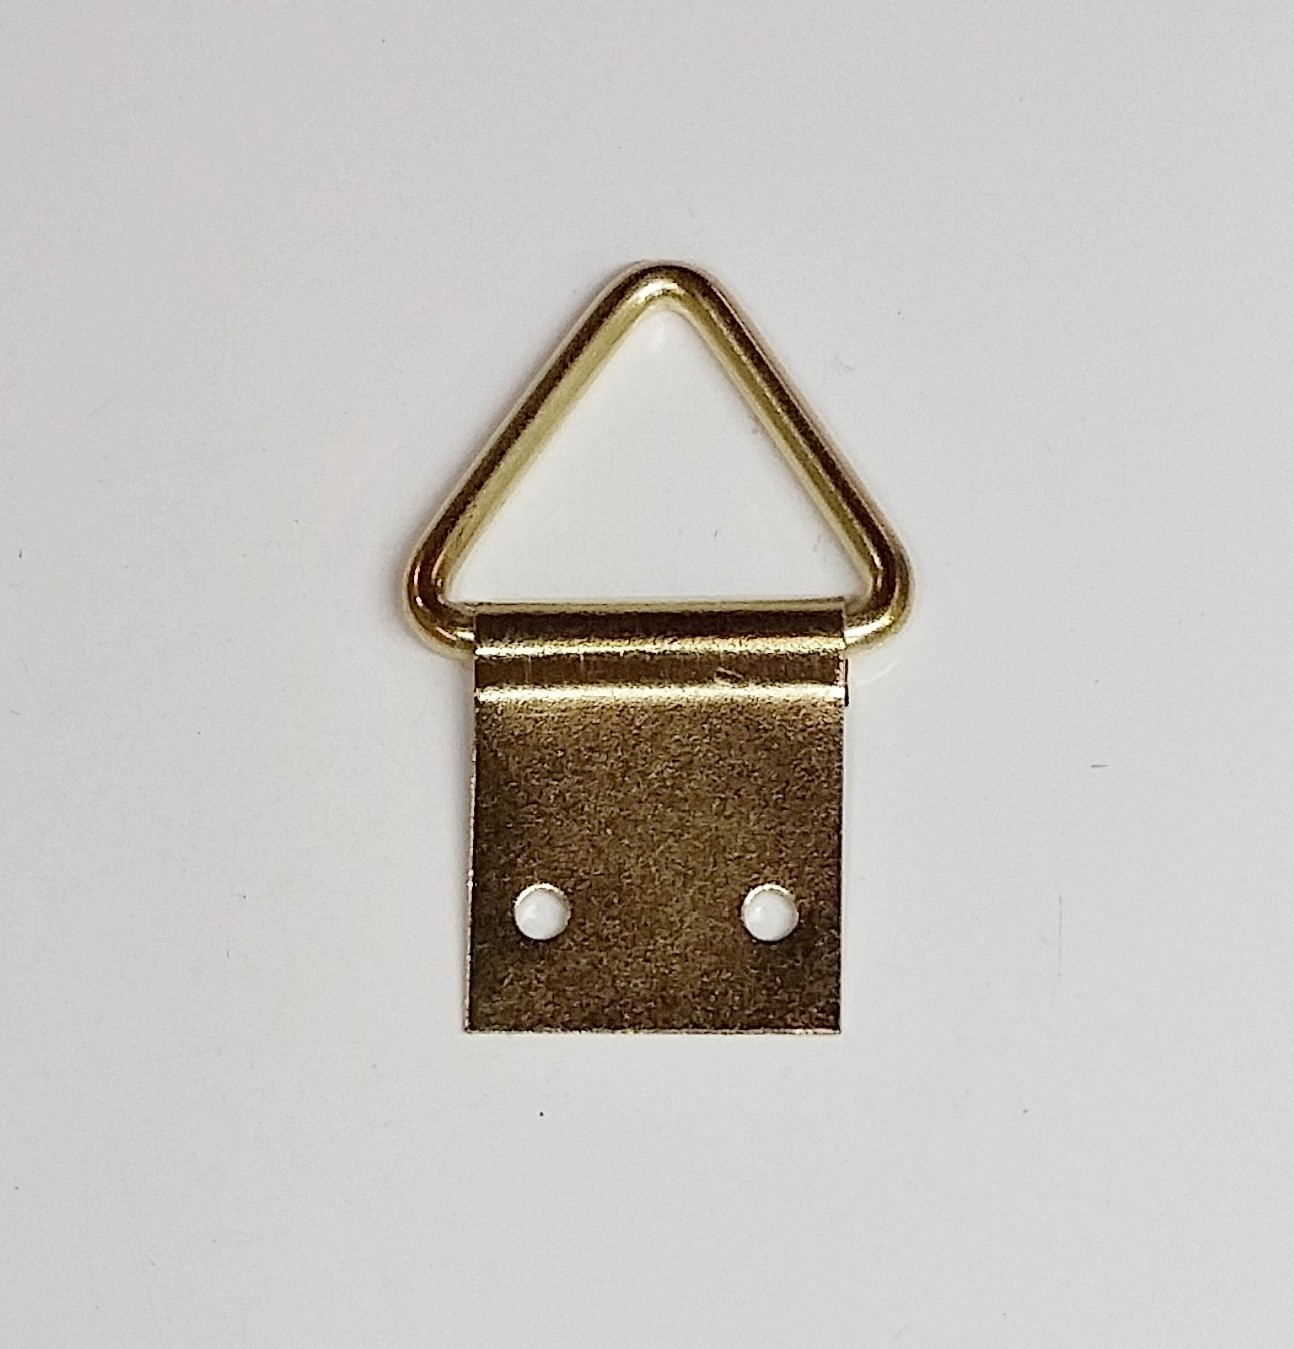 Suporte p/ Quadros Triângulo 18mm x 41mm Latonado